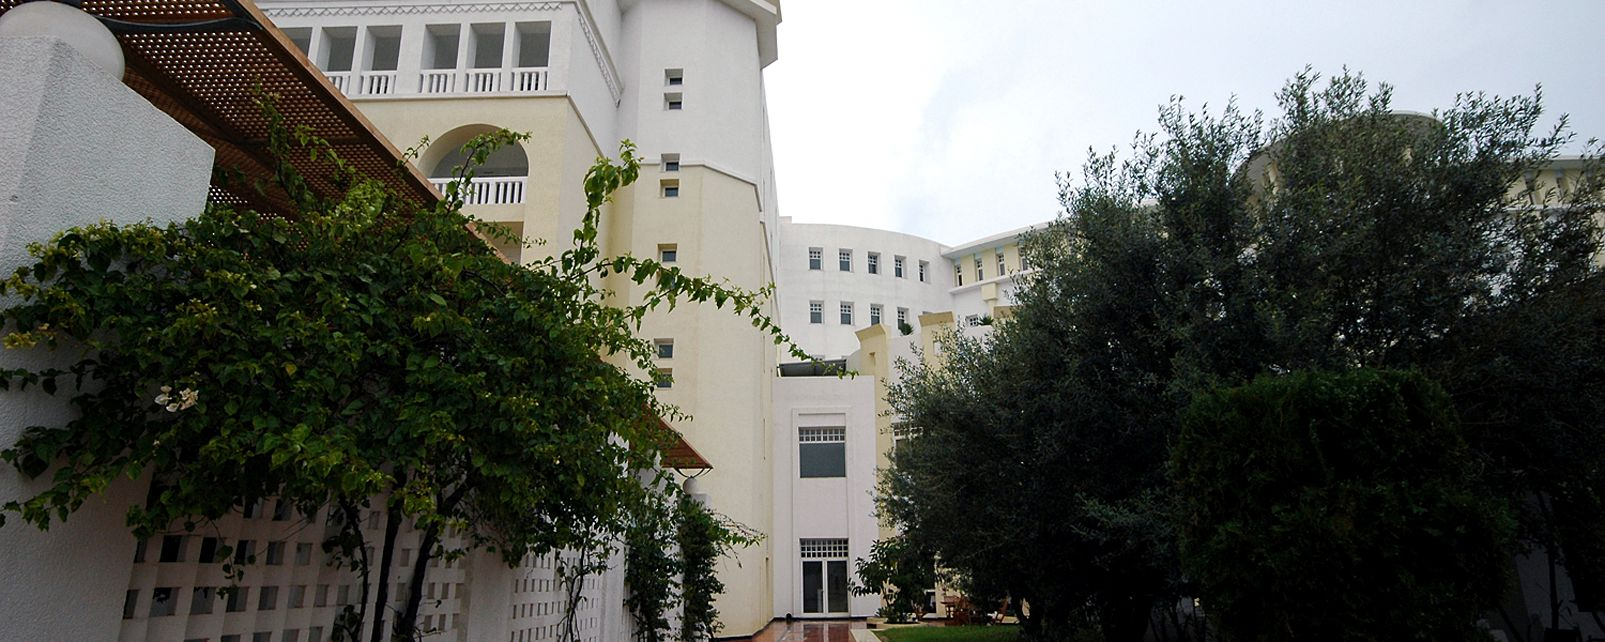 Hôtel Medina Solaria & Thalasso